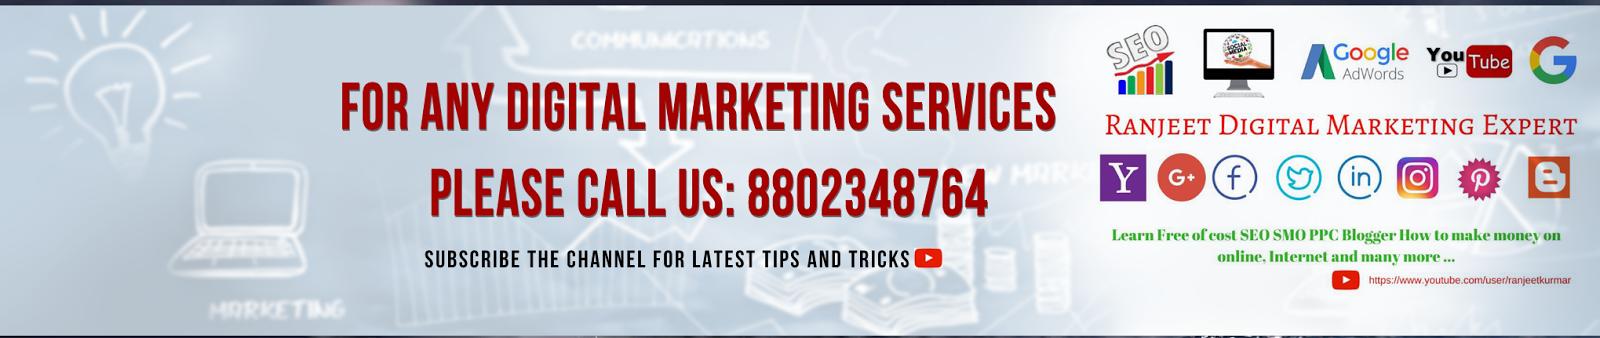 Ranjeet SEO SMO PPC Expert | Digital Marketing Expert